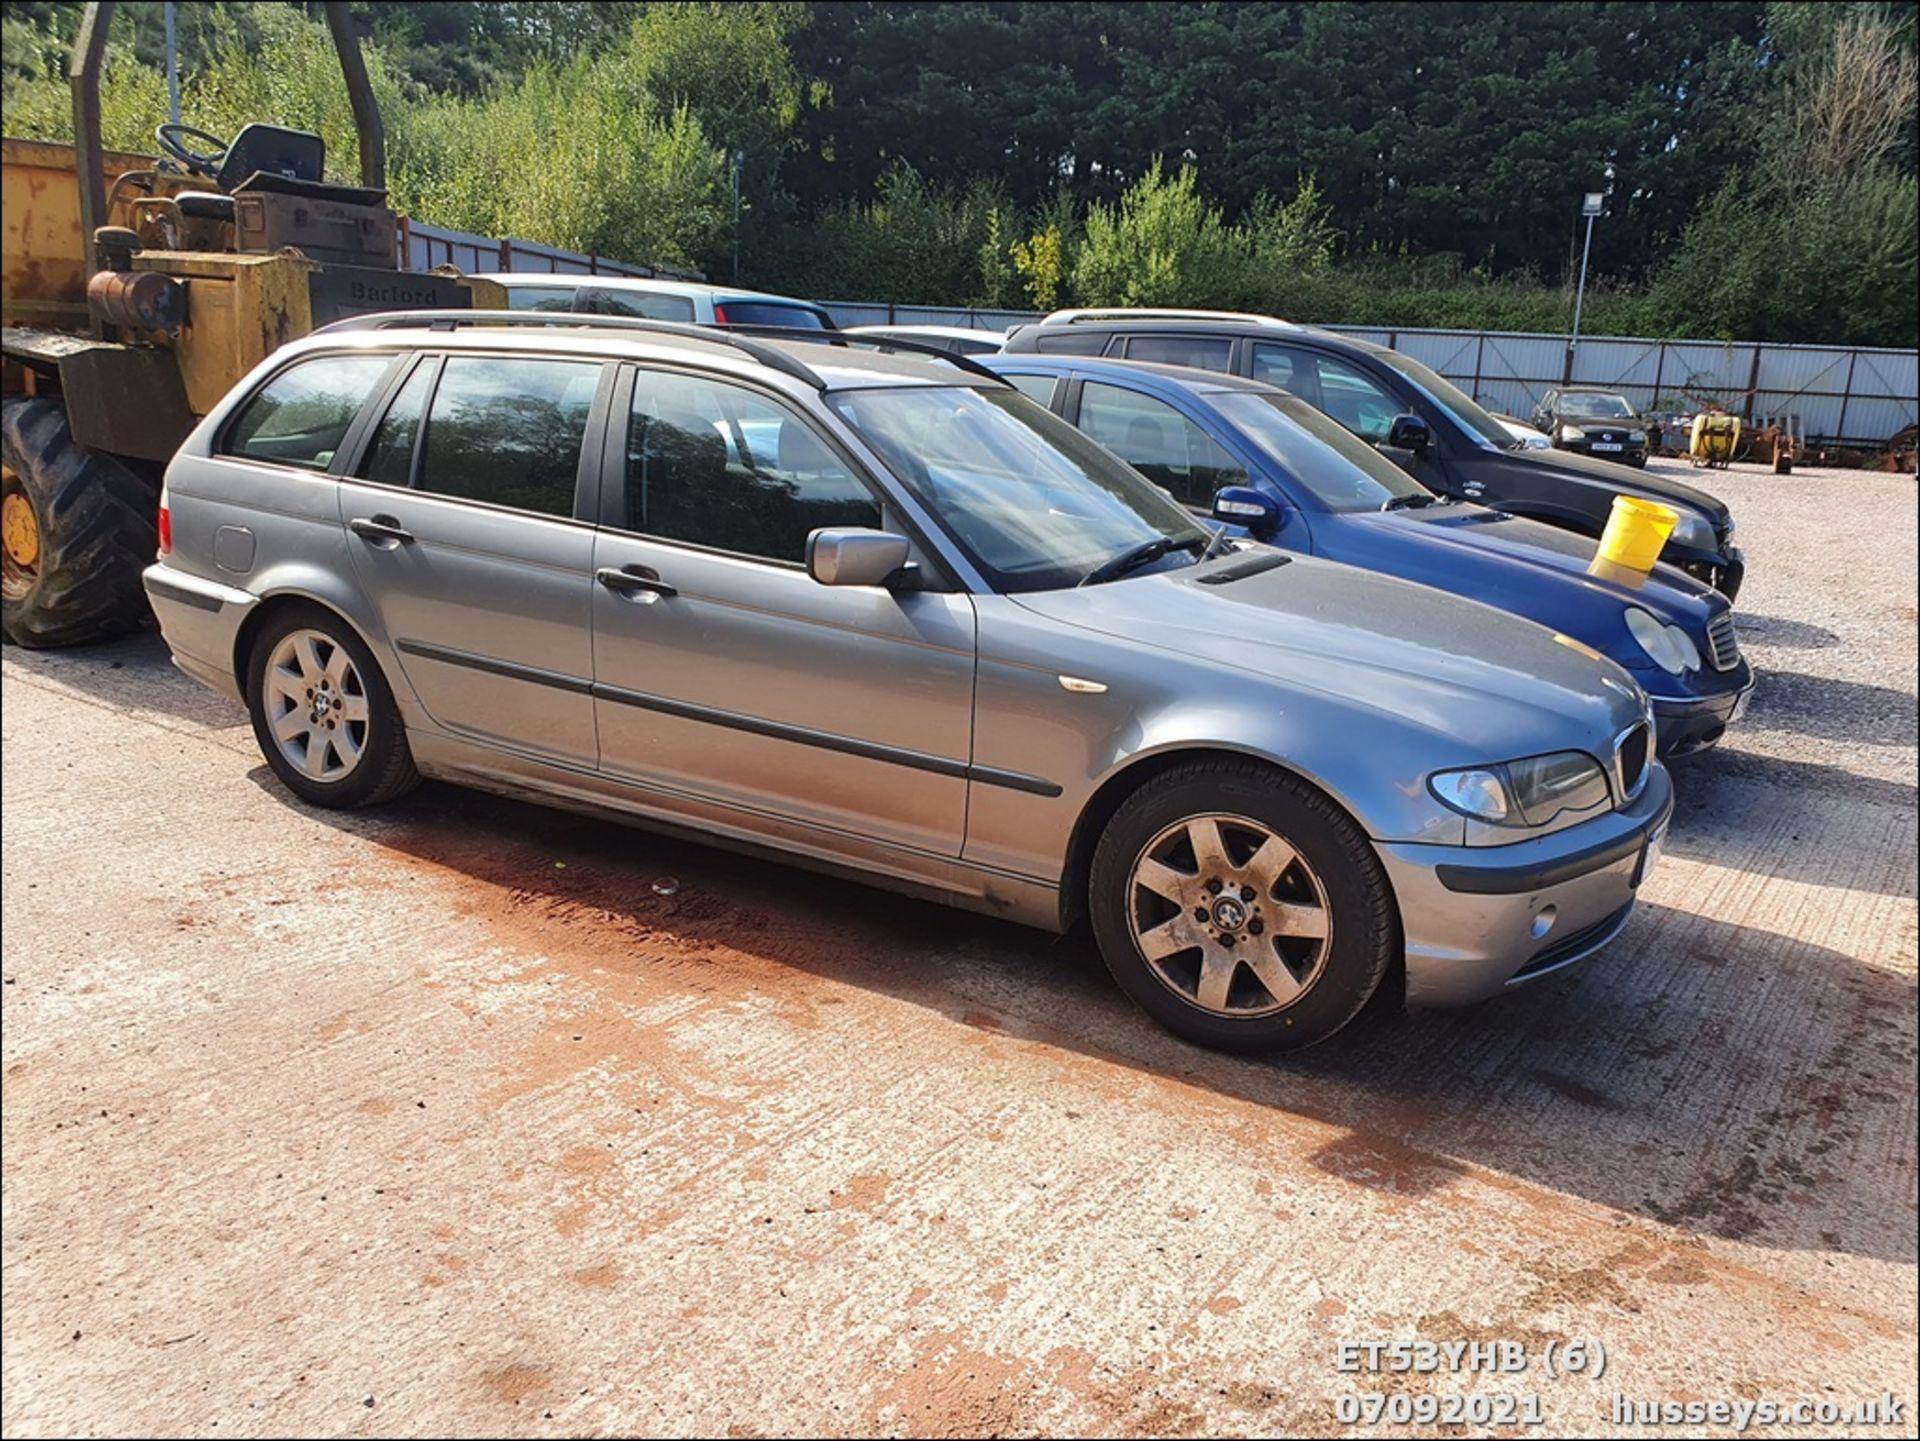 04/53 BMW 318I SE TOURING - 1995cc 5dr Estate (Grey) - Image 6 of 16